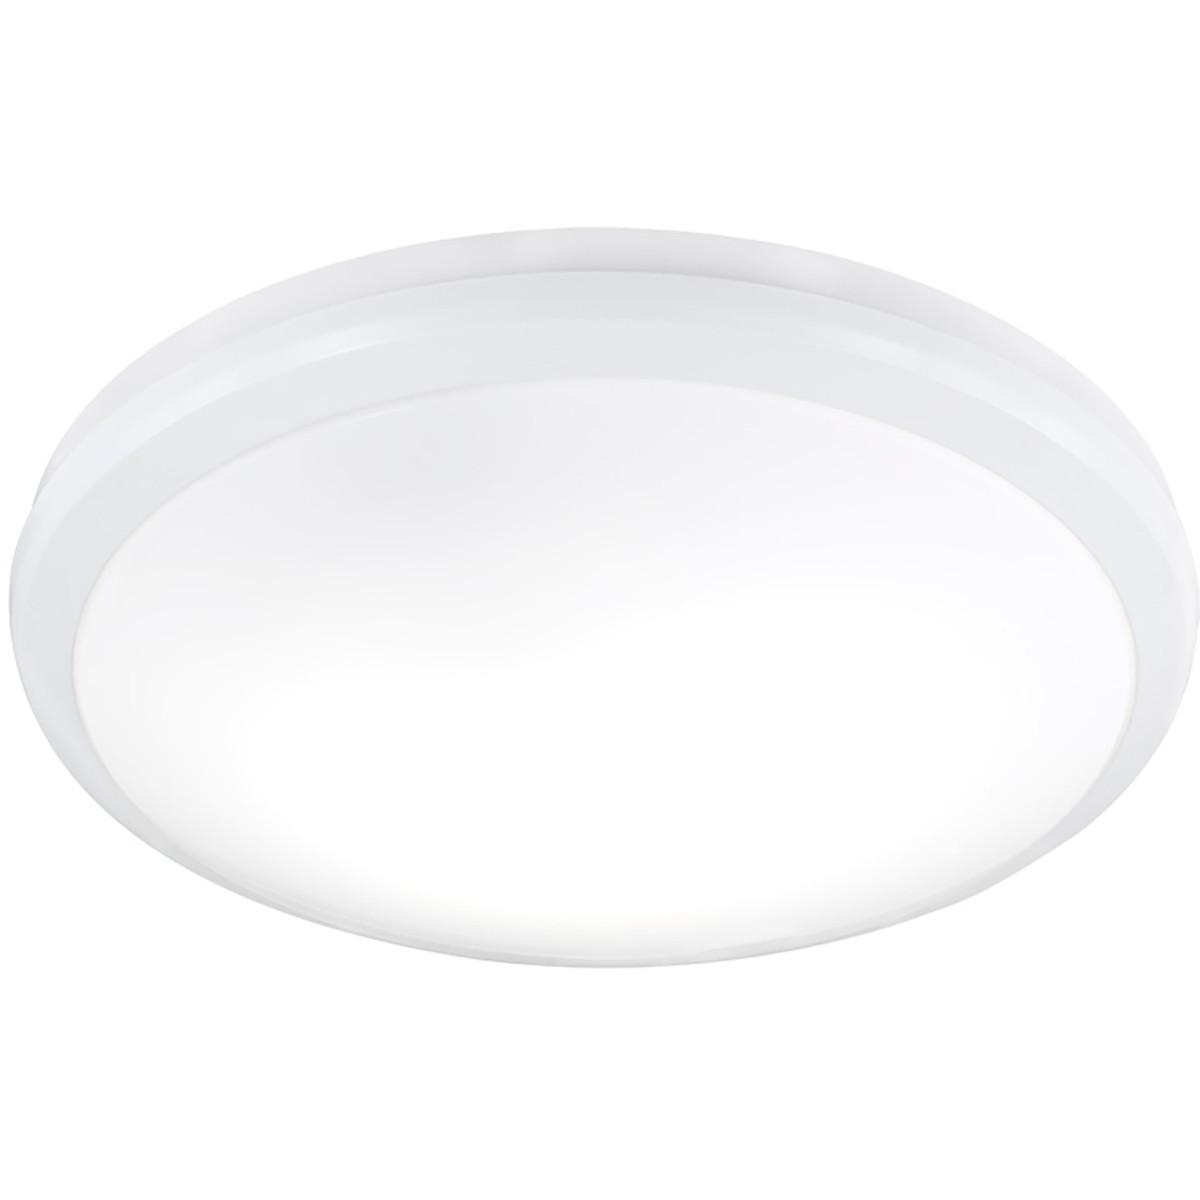 LED Plafondlamp met Bewegingssensor - Trion Avi - Opbouw Rond 5W - Warm Wit 3000K - 360° - Mat Grijs